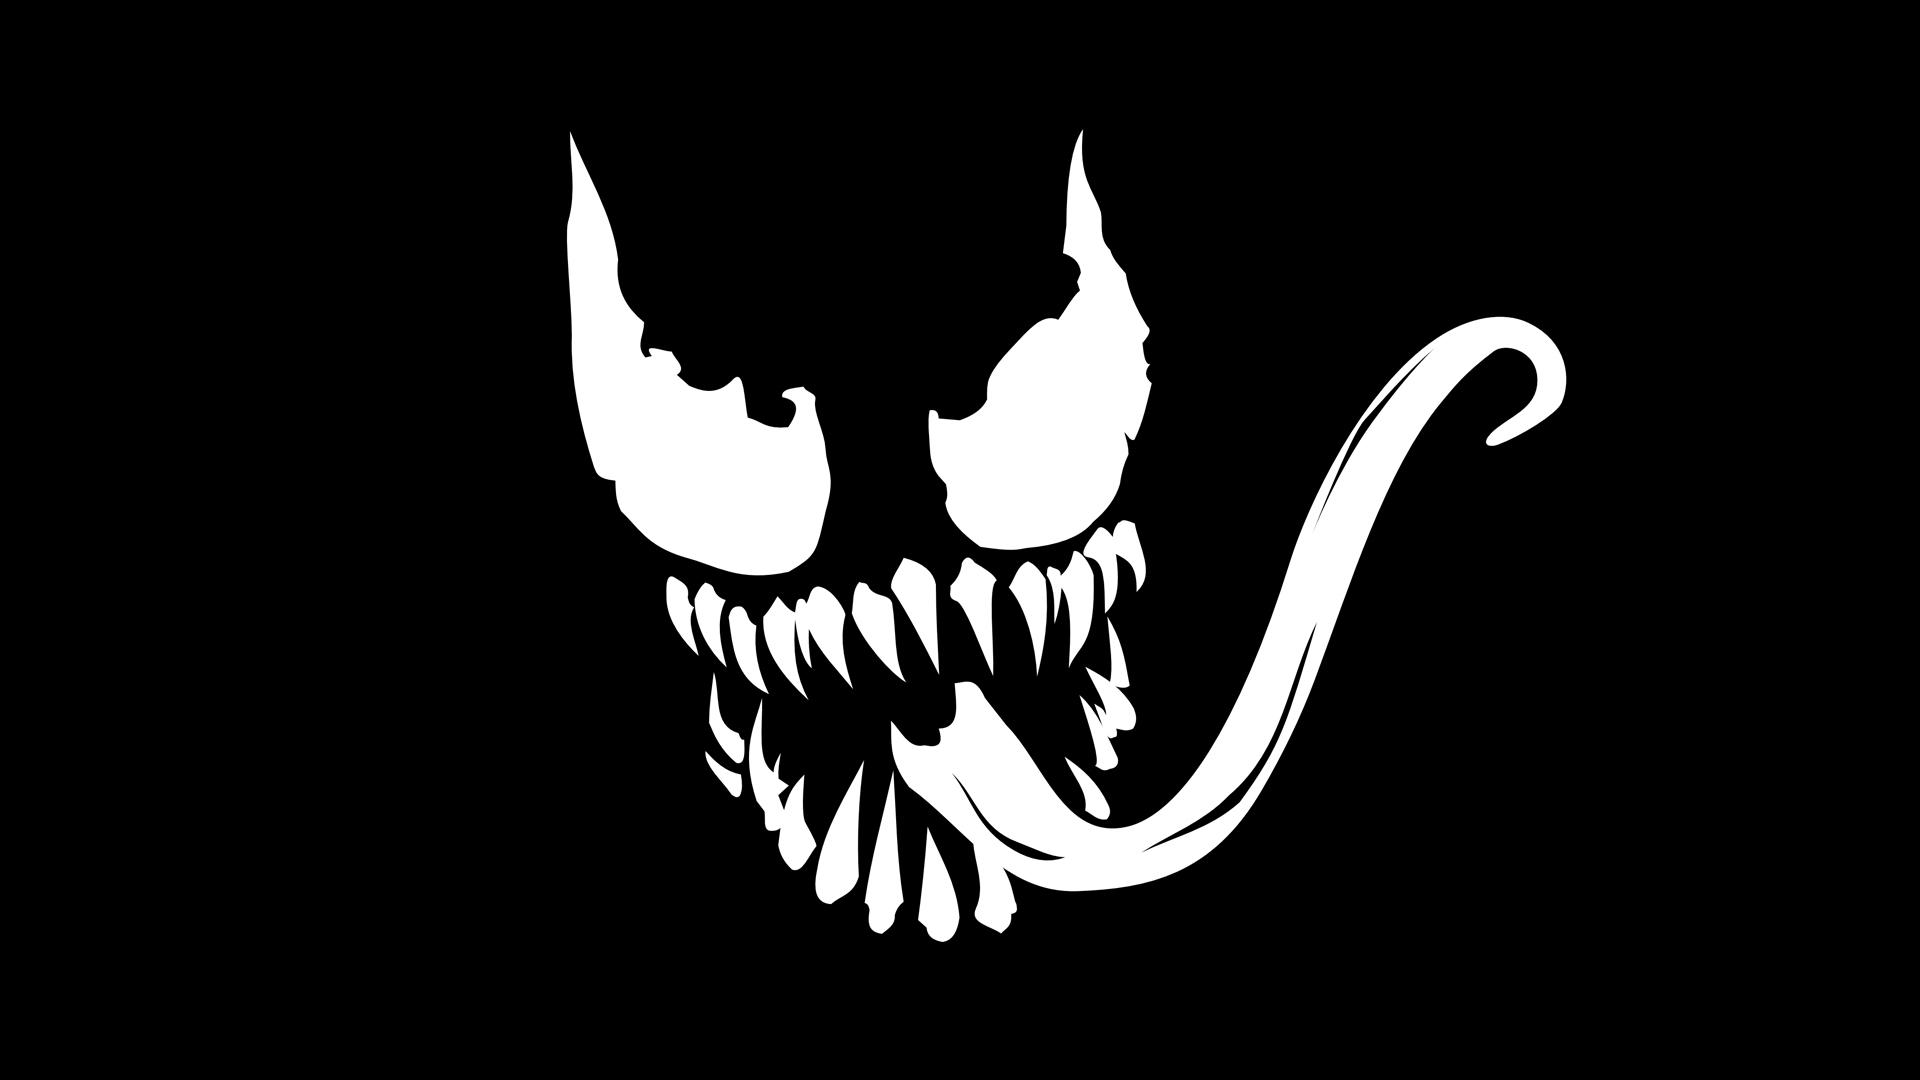 venom marvel logo with dark background hd wallpapers